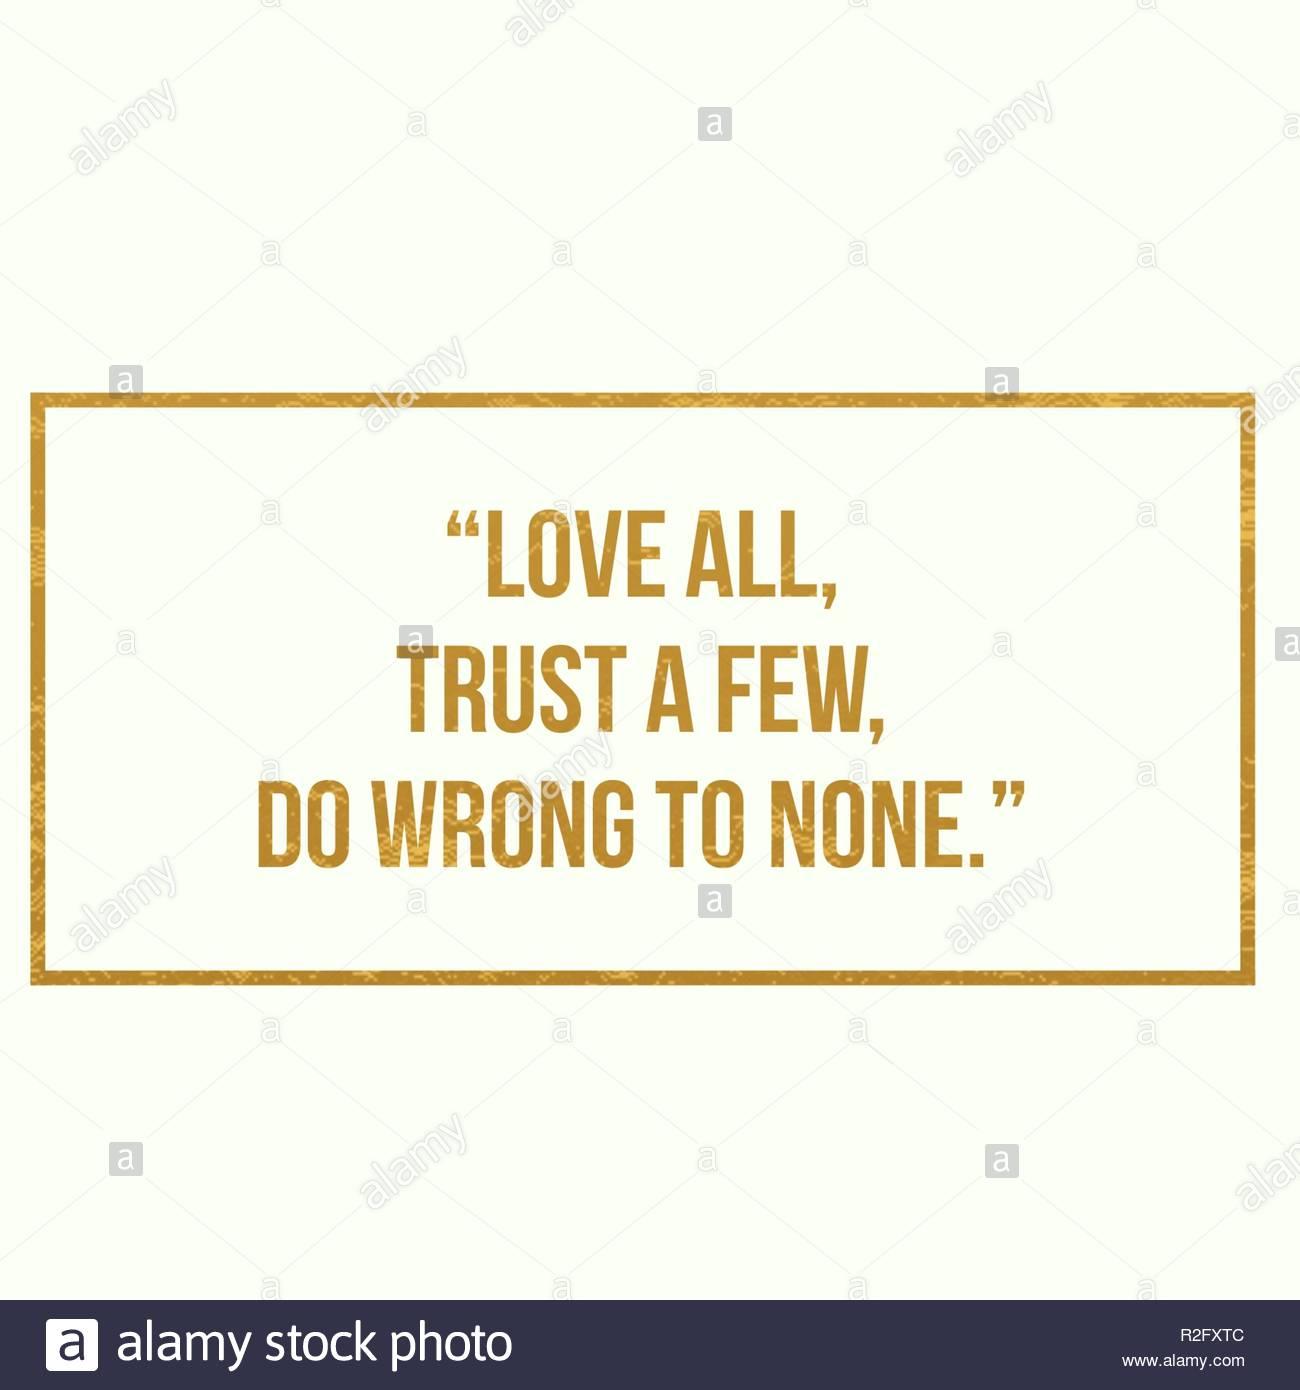 love all but trust a few